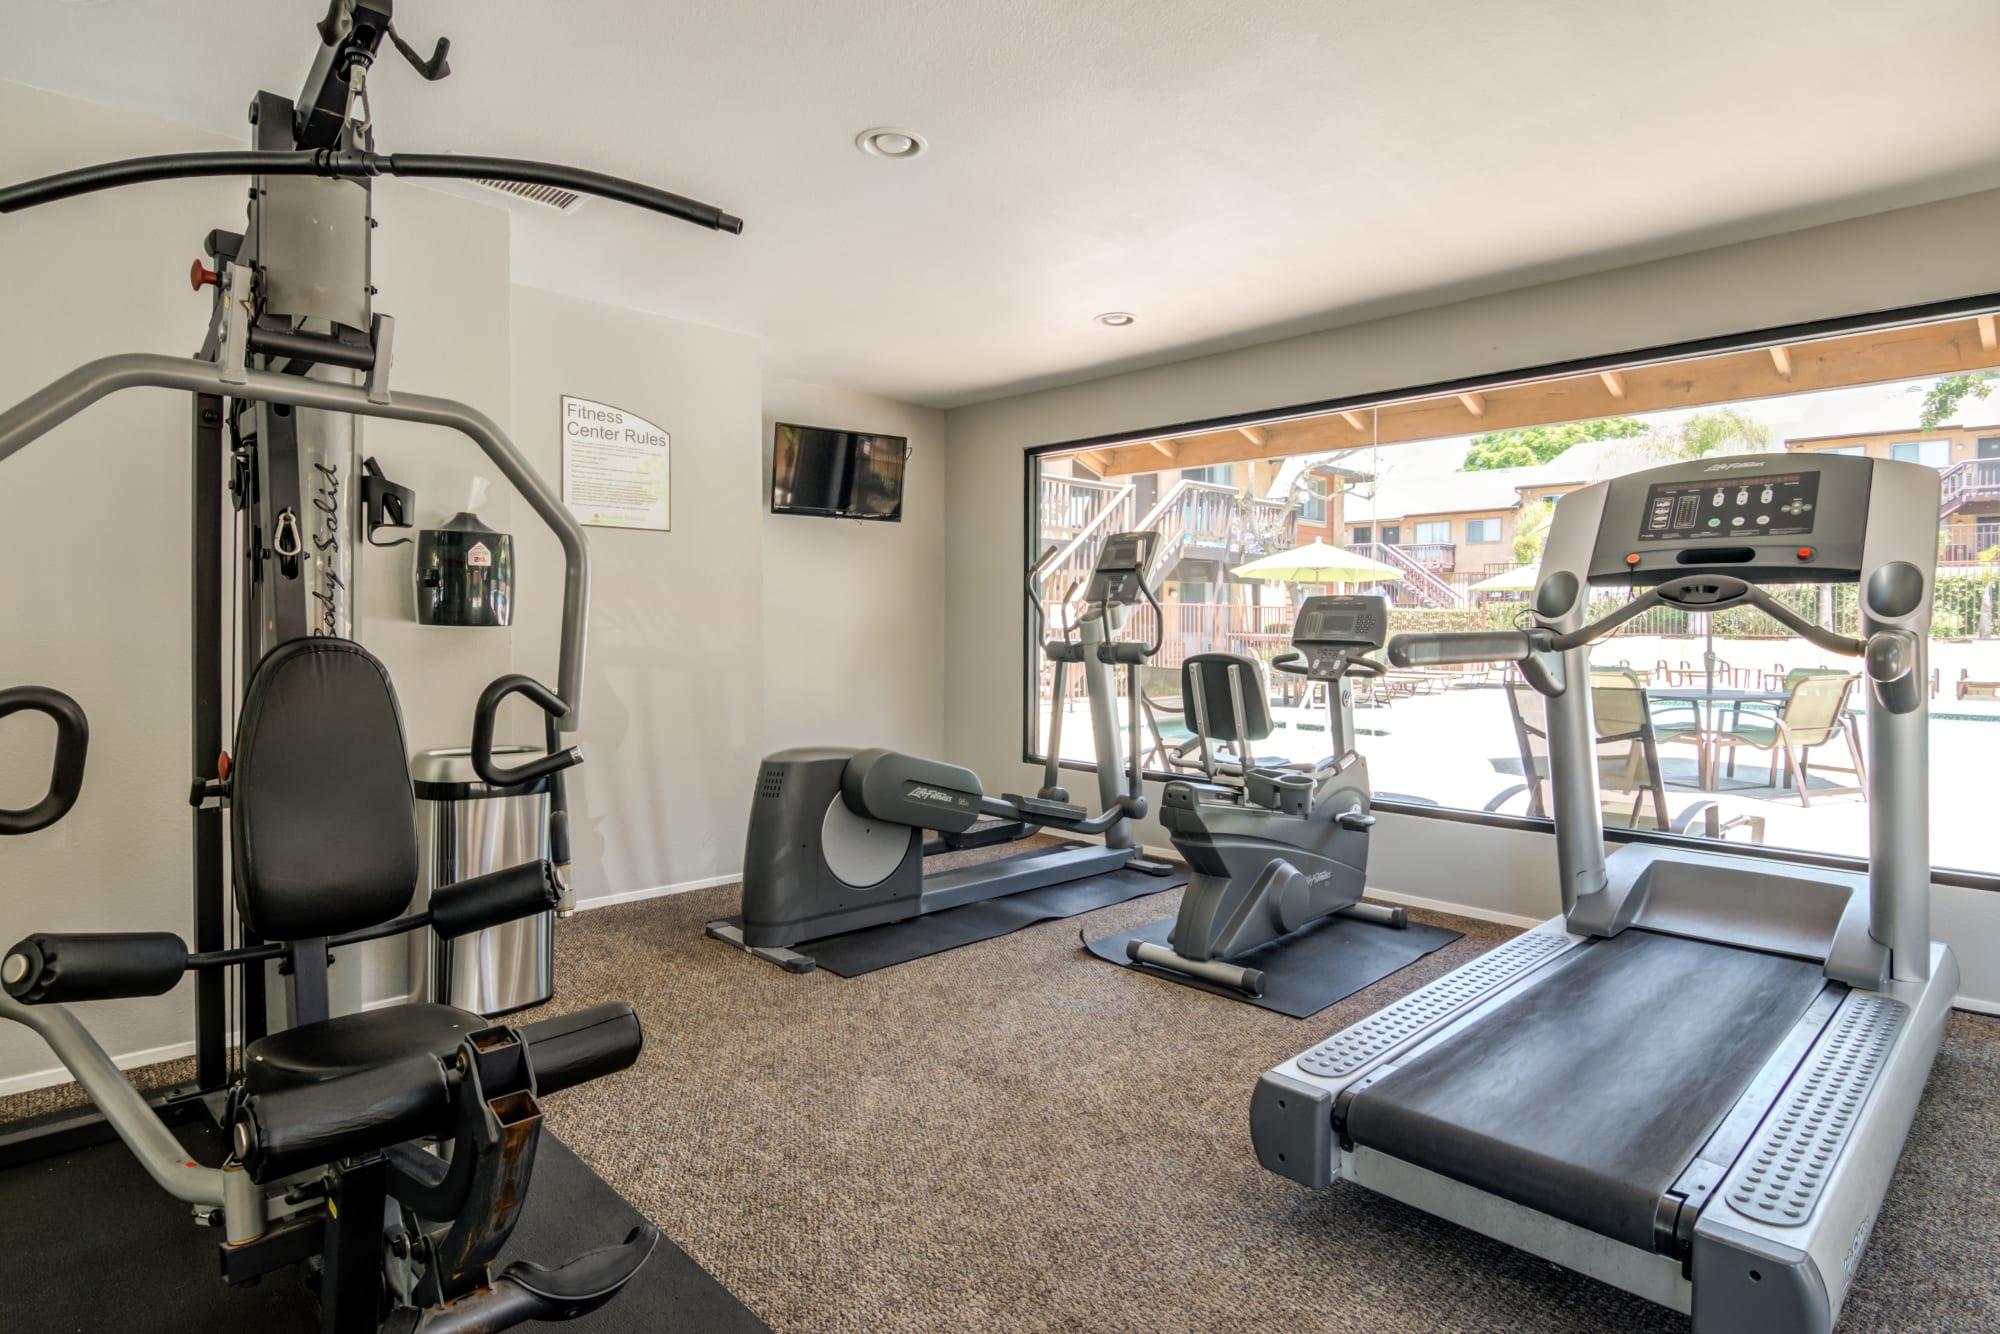 The fitness center at Hillside Terrace Apartments in Lemon Grove, California